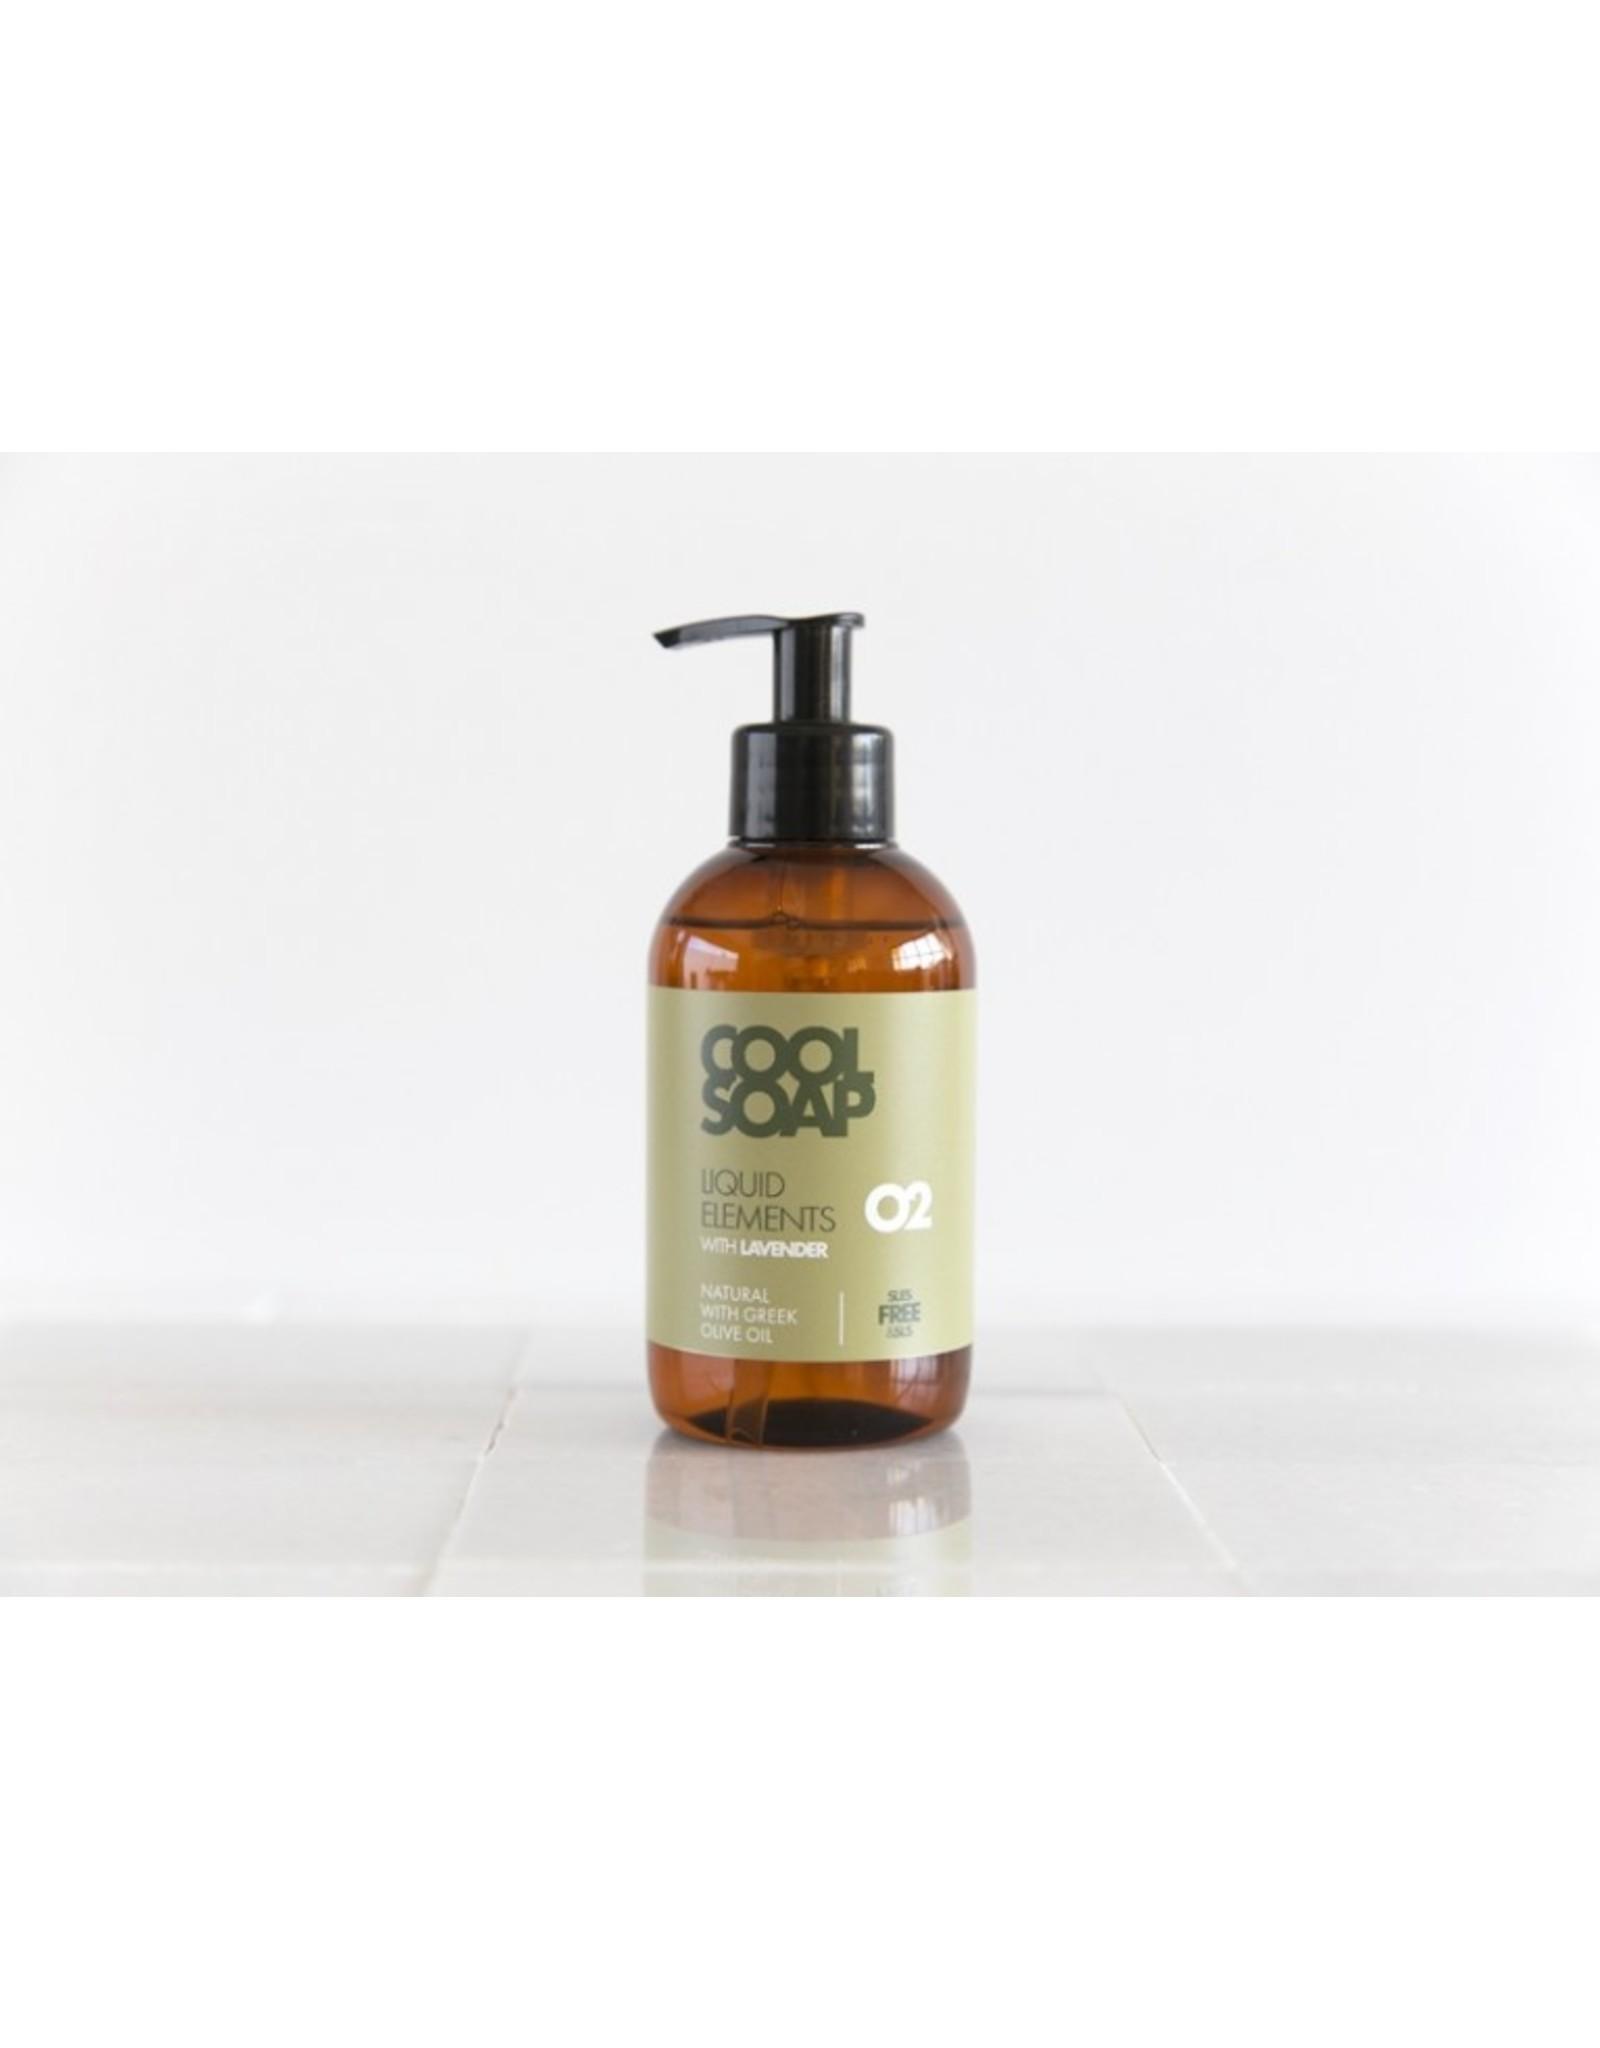 Cool Soap Cool Soap Liquids 02 - Lavender - 250 ml